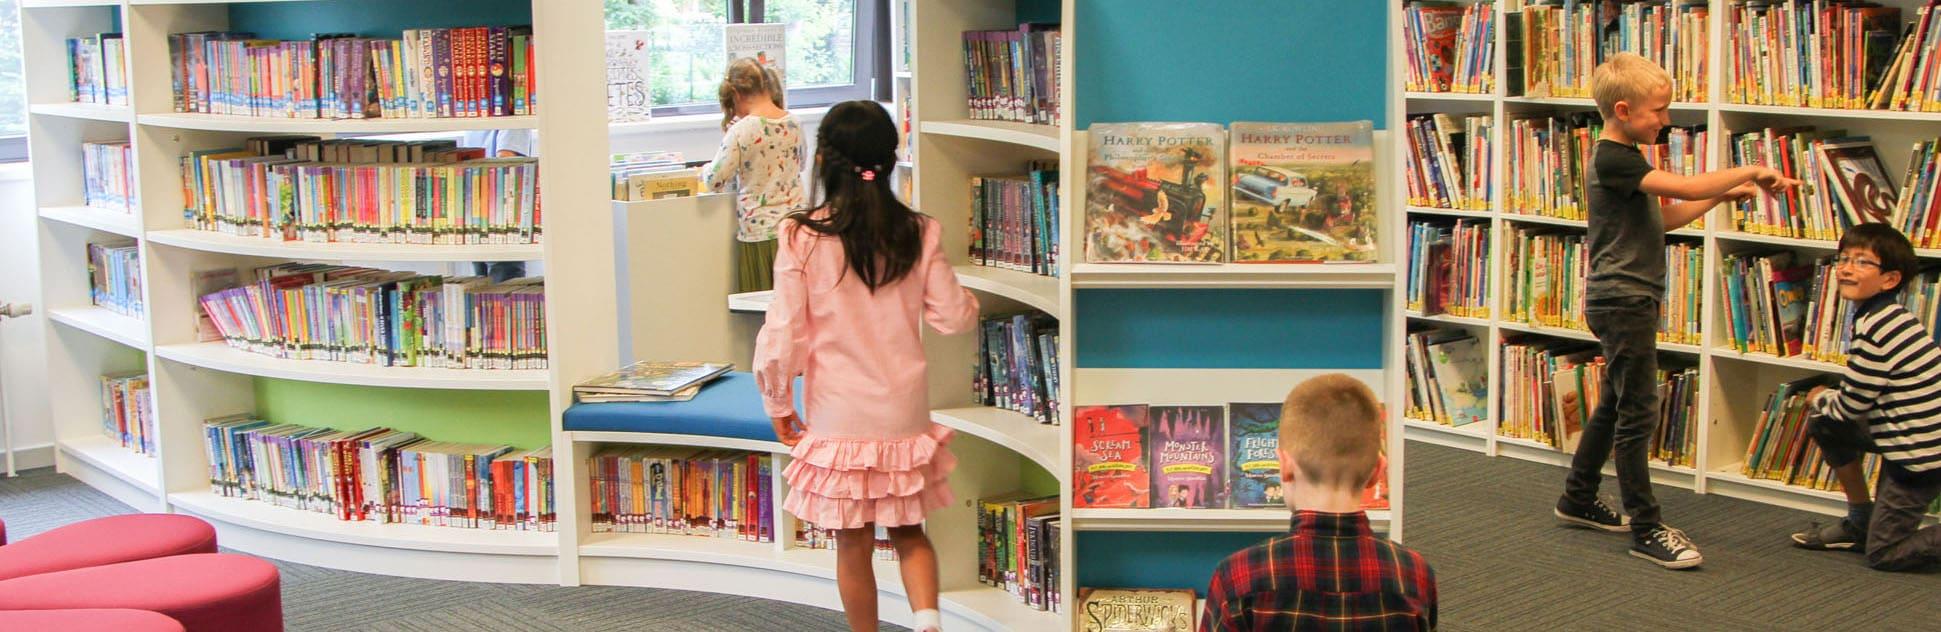 hero-news-bsb-rubens-library-is-transformed